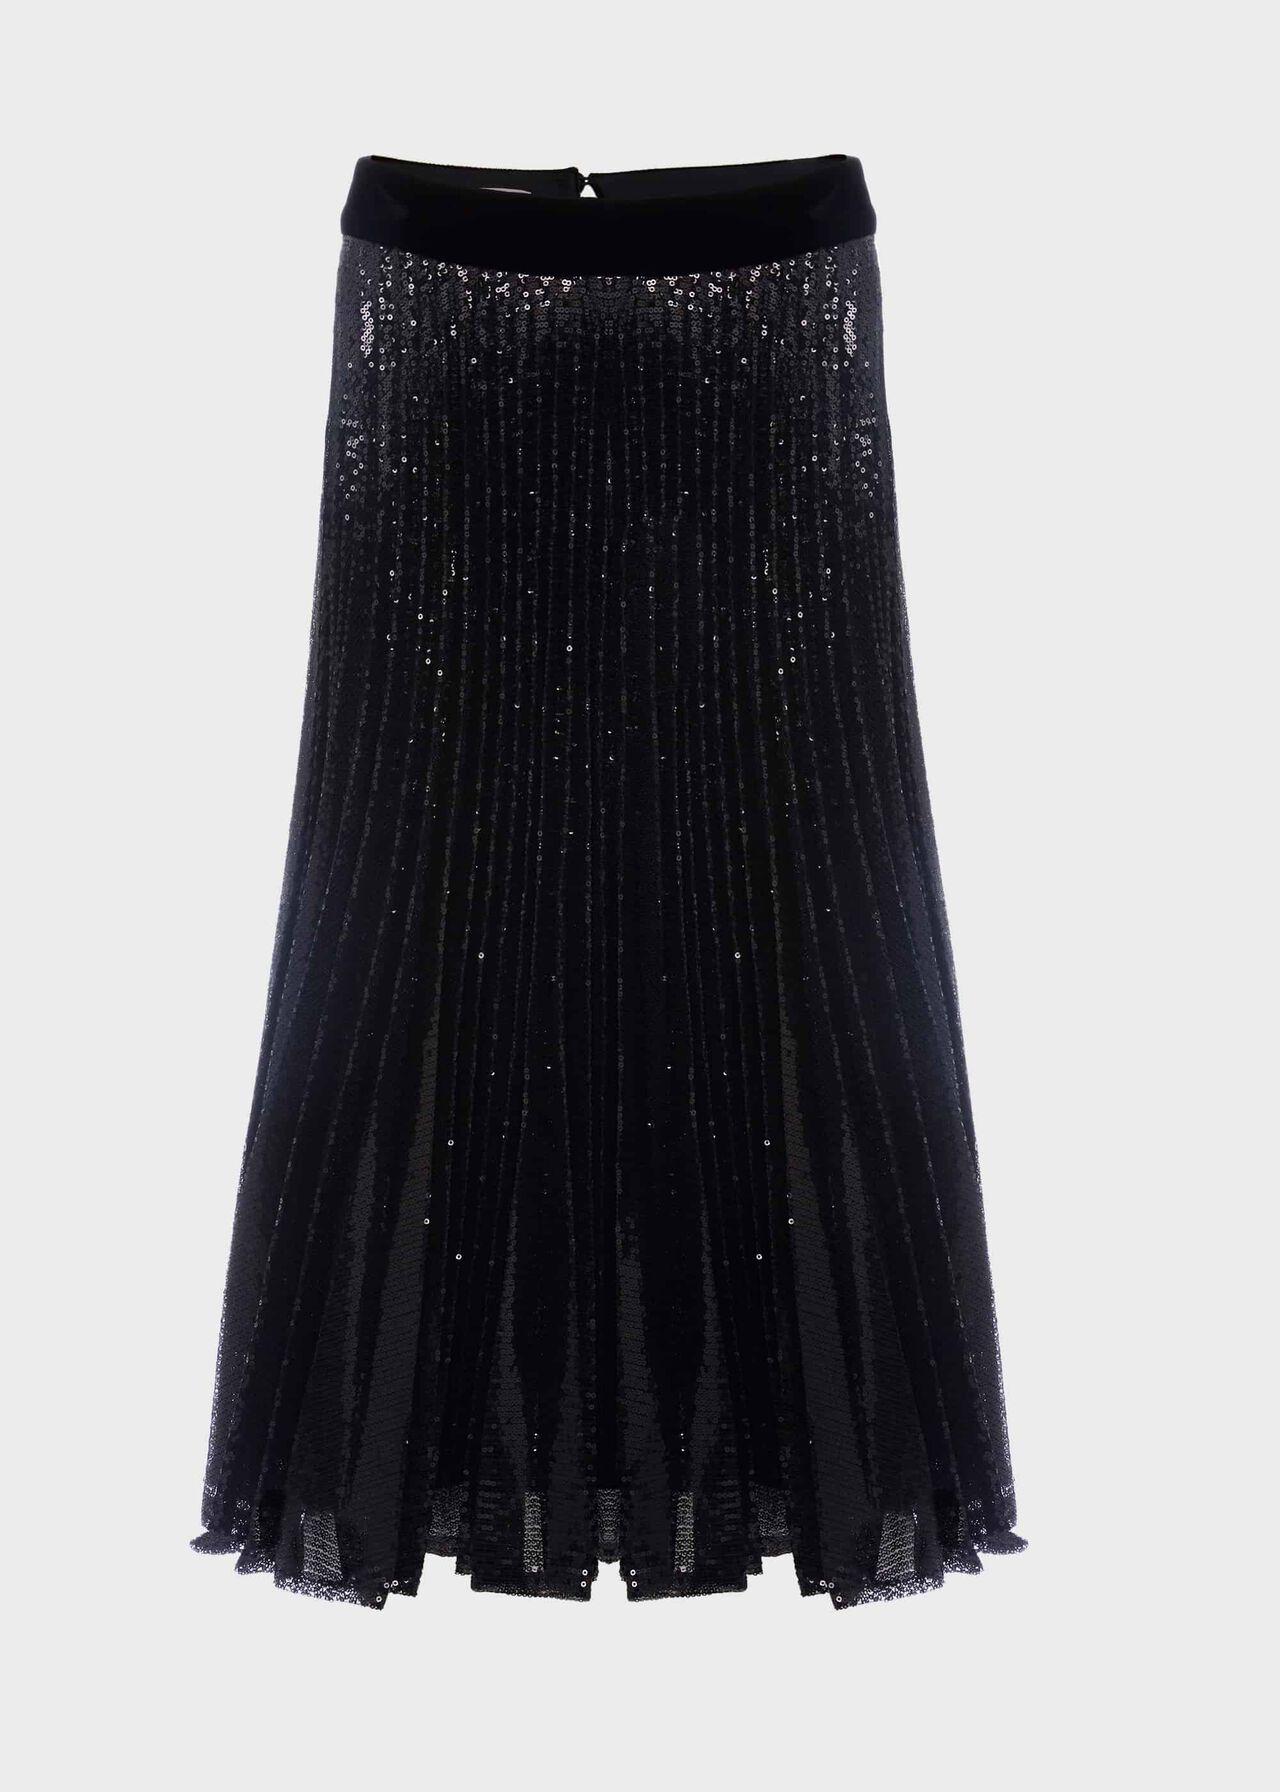 Claudette Sequin Skirt Black